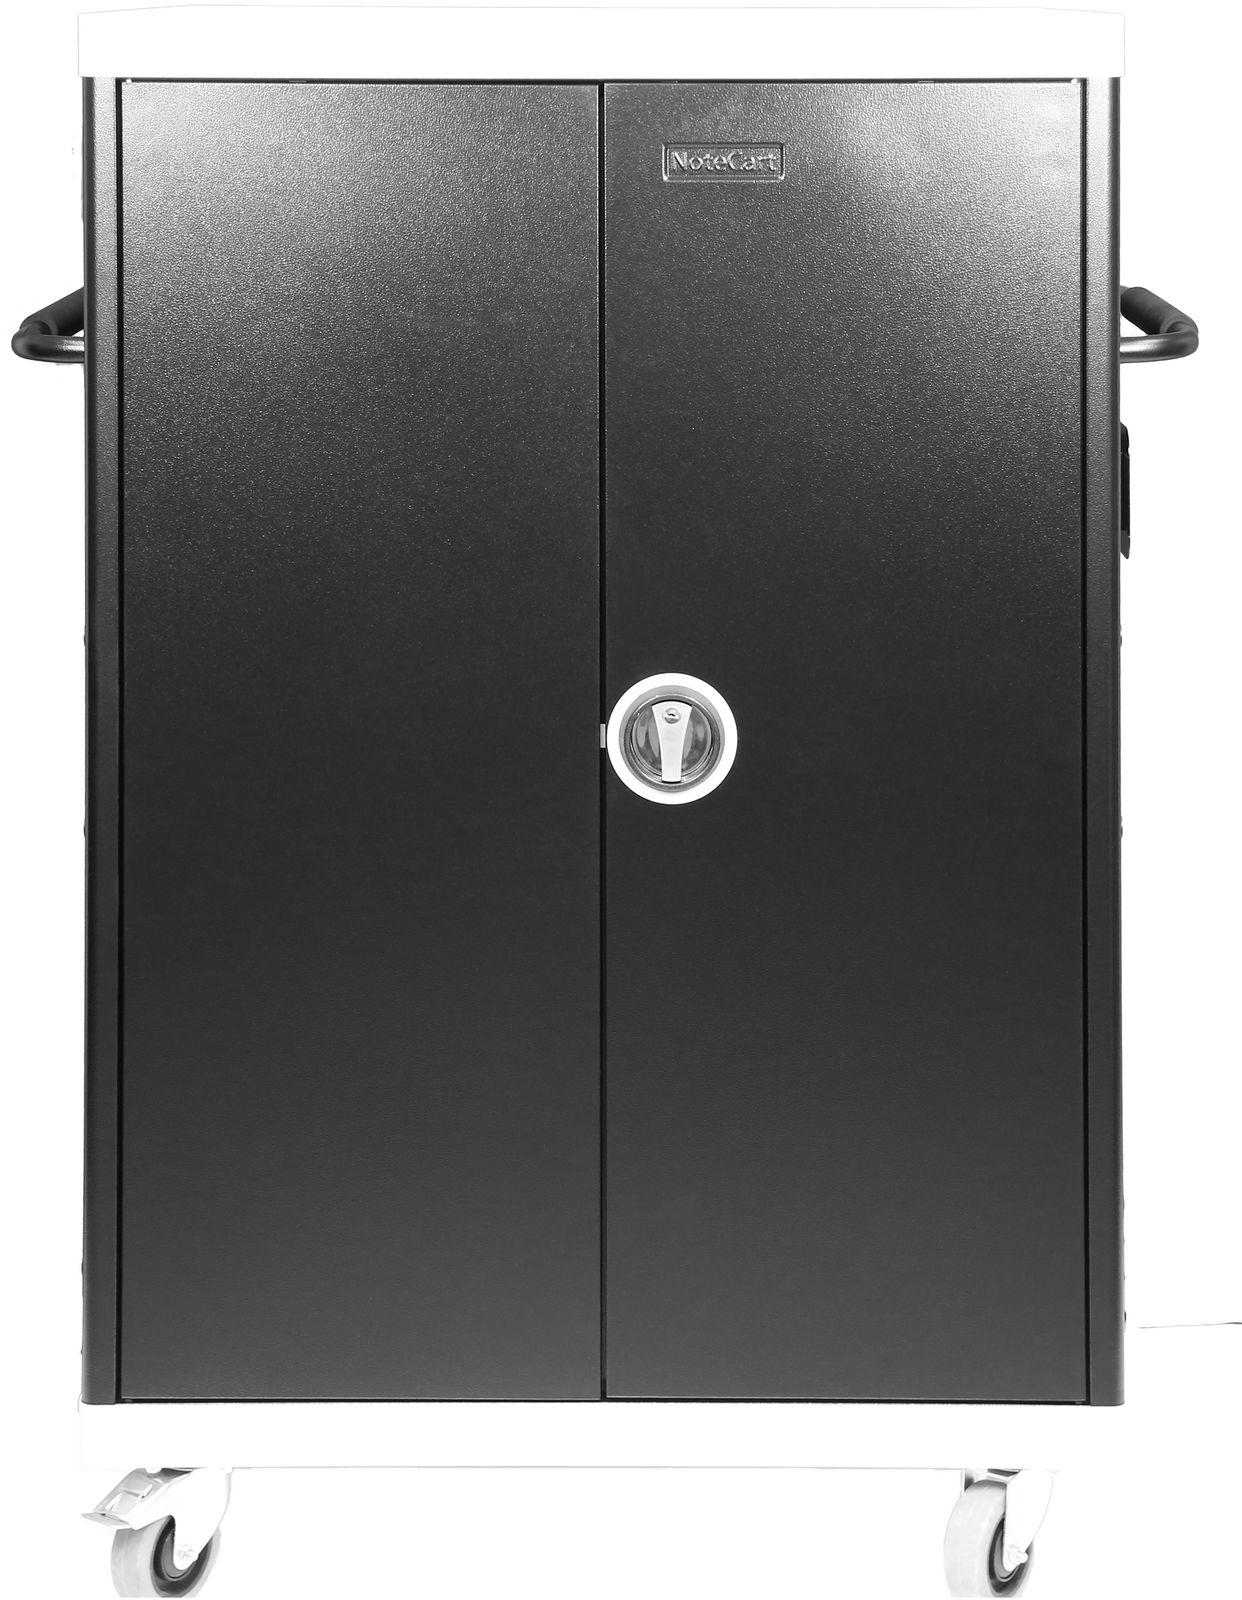 Leba NoteCart Unifit for 32 Laptops Fix shelv. 32 SC power sockets NCU-32-FH-419-SC - eet01